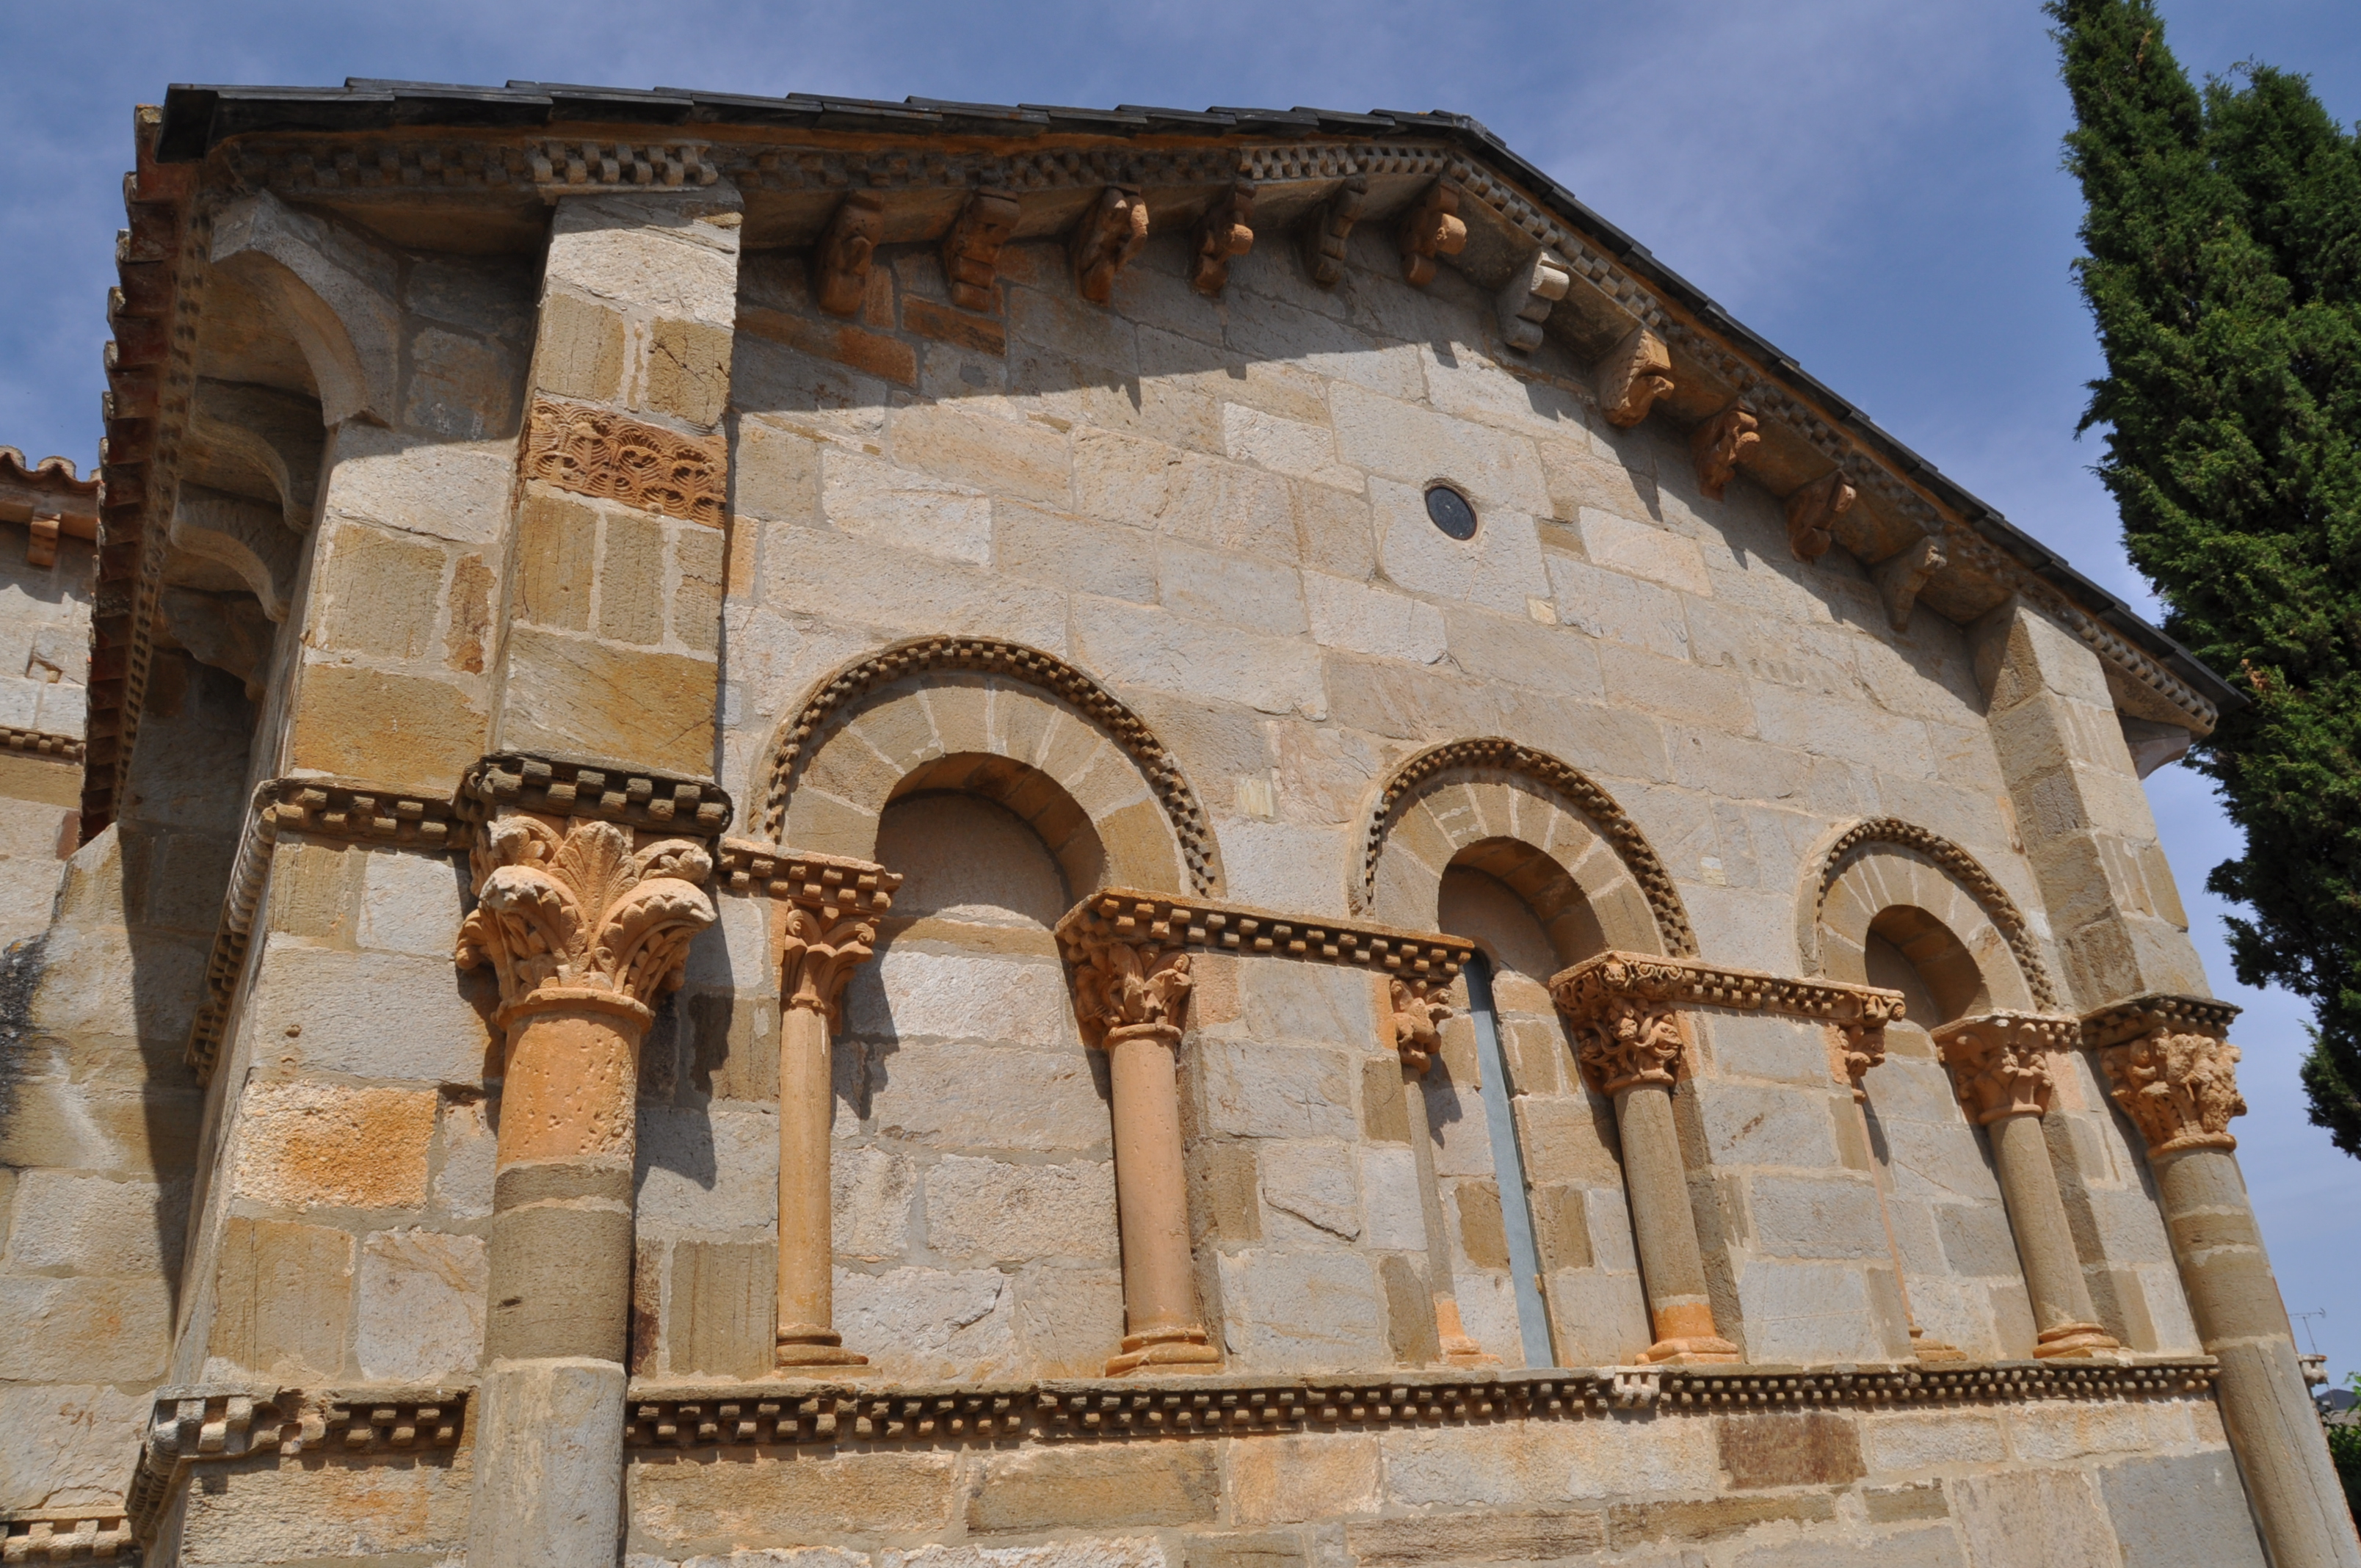 Ábside de Santa Marta de Tera (Zamora)